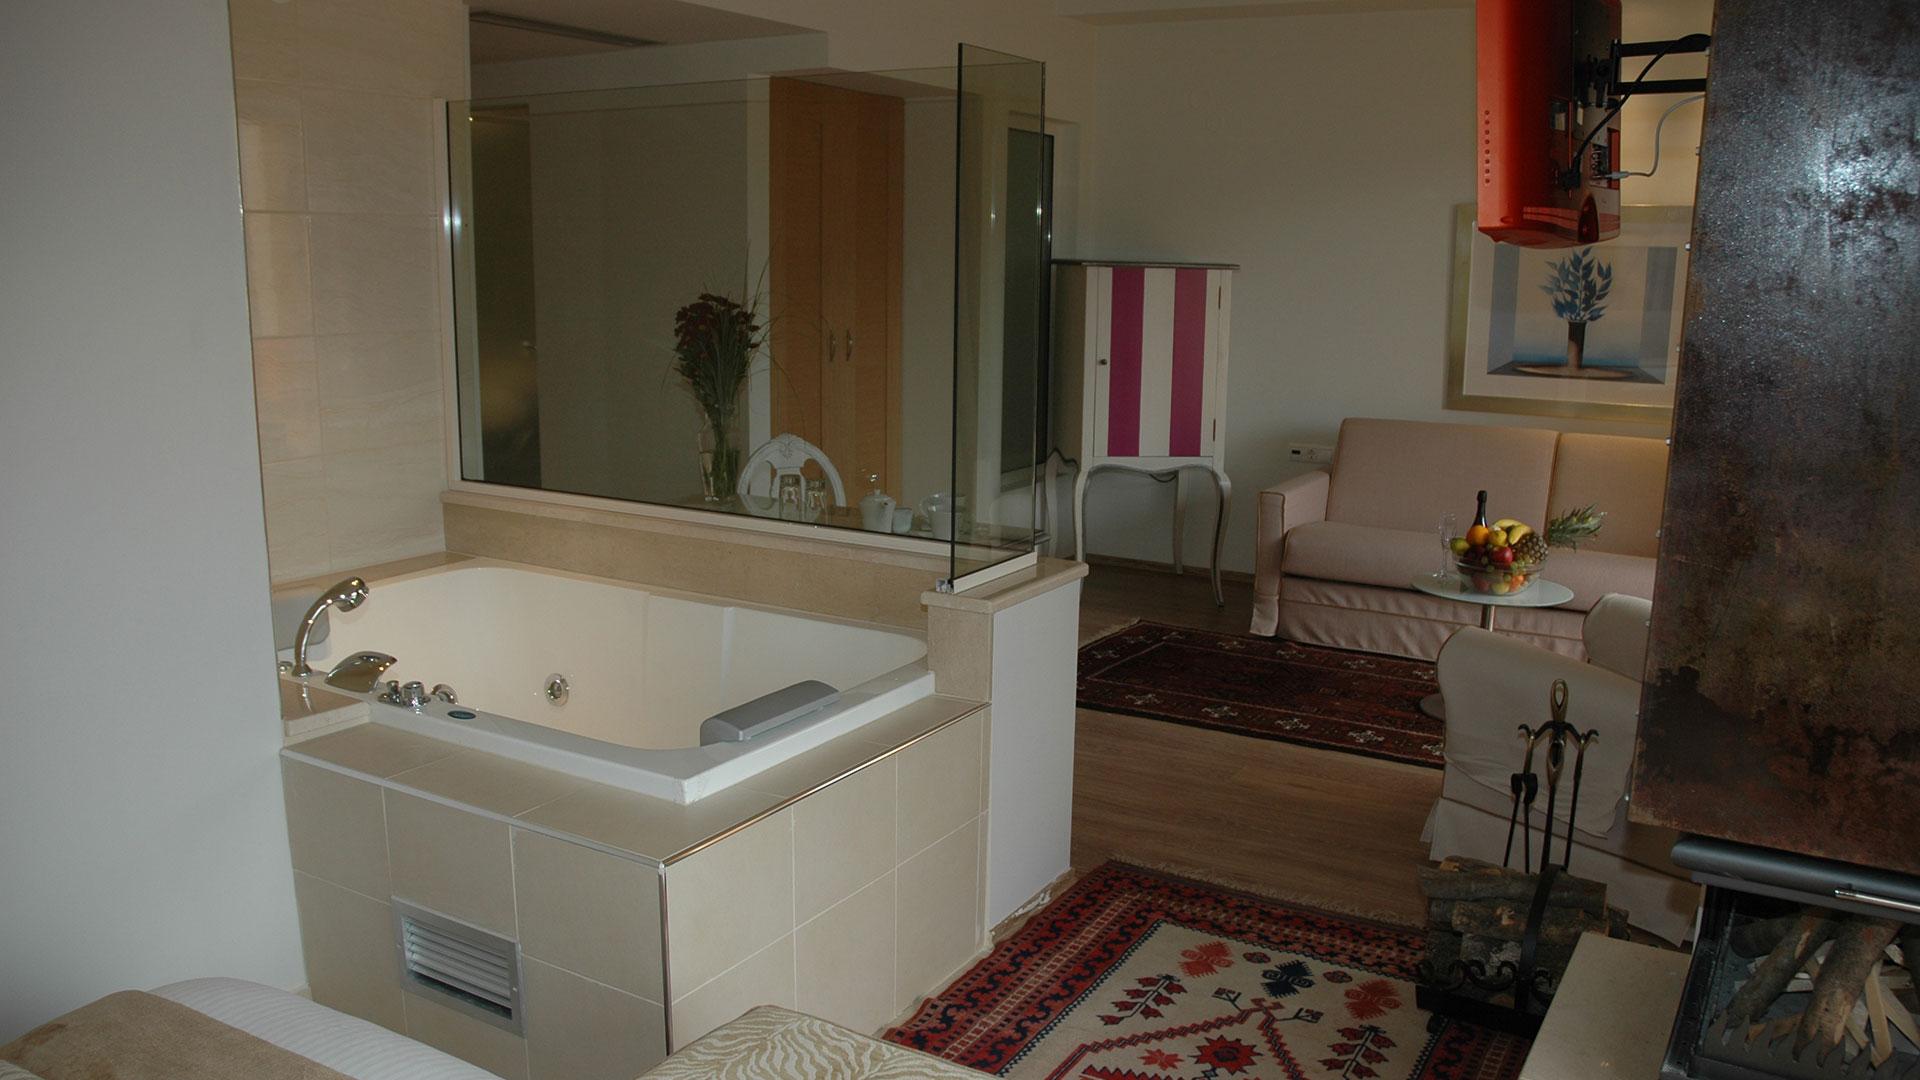 Superior Suite with Jacuzzi/Hot Tub